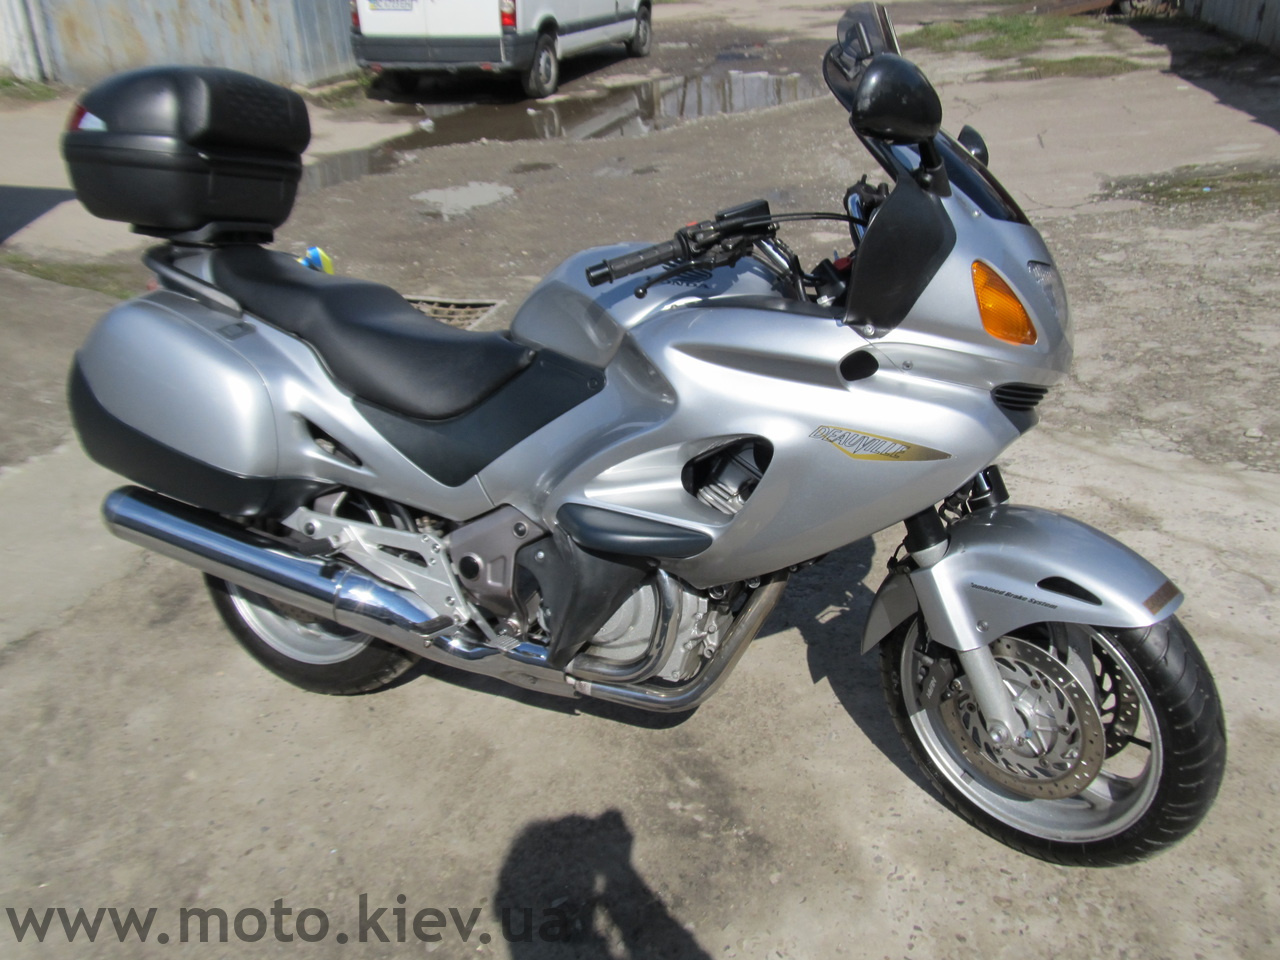 SUBJ: Мотоцикл  Honda Deauville 650  3900 USD Торг